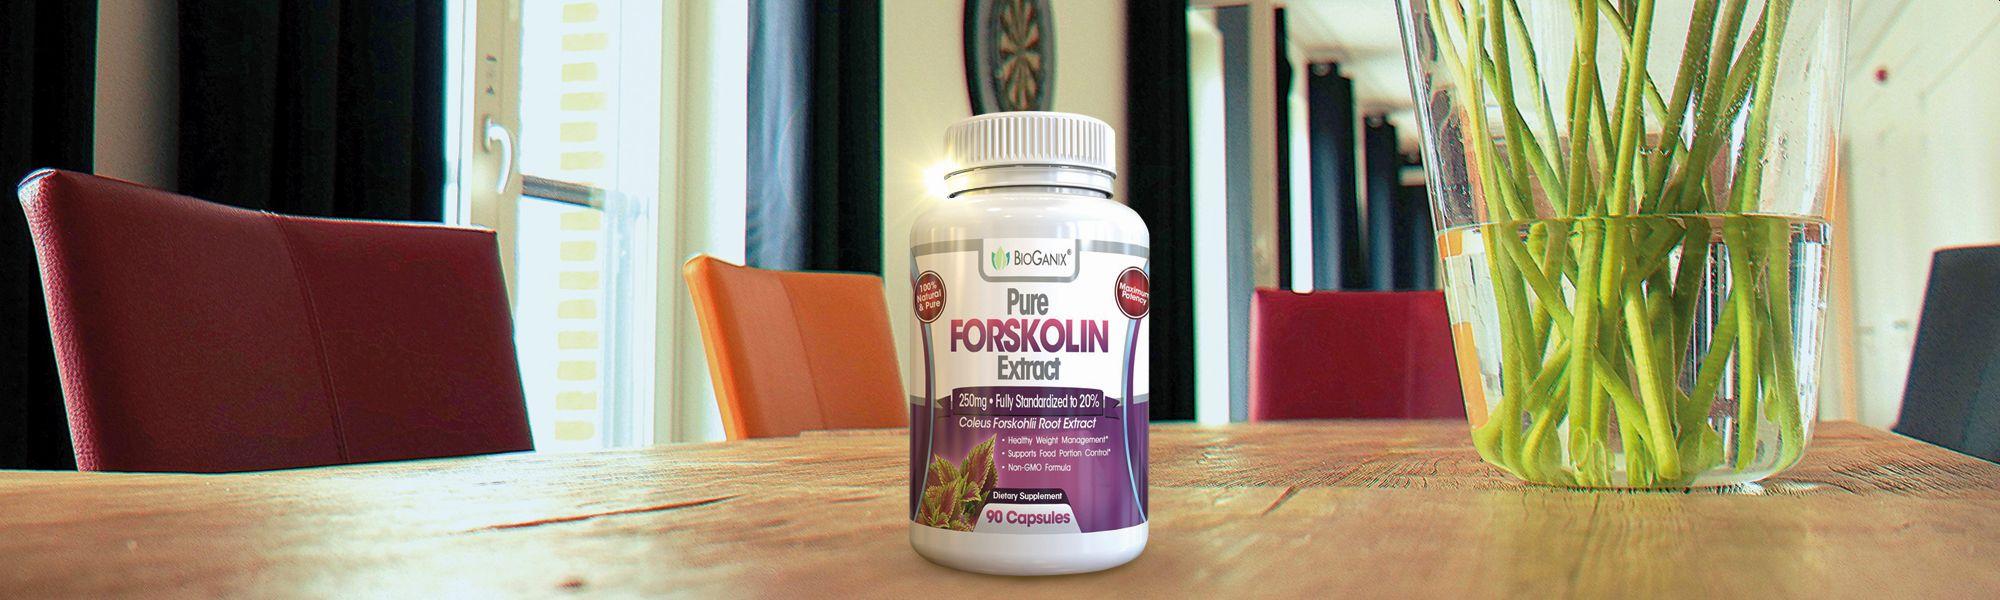 BioGanix Pure Forskolin Review